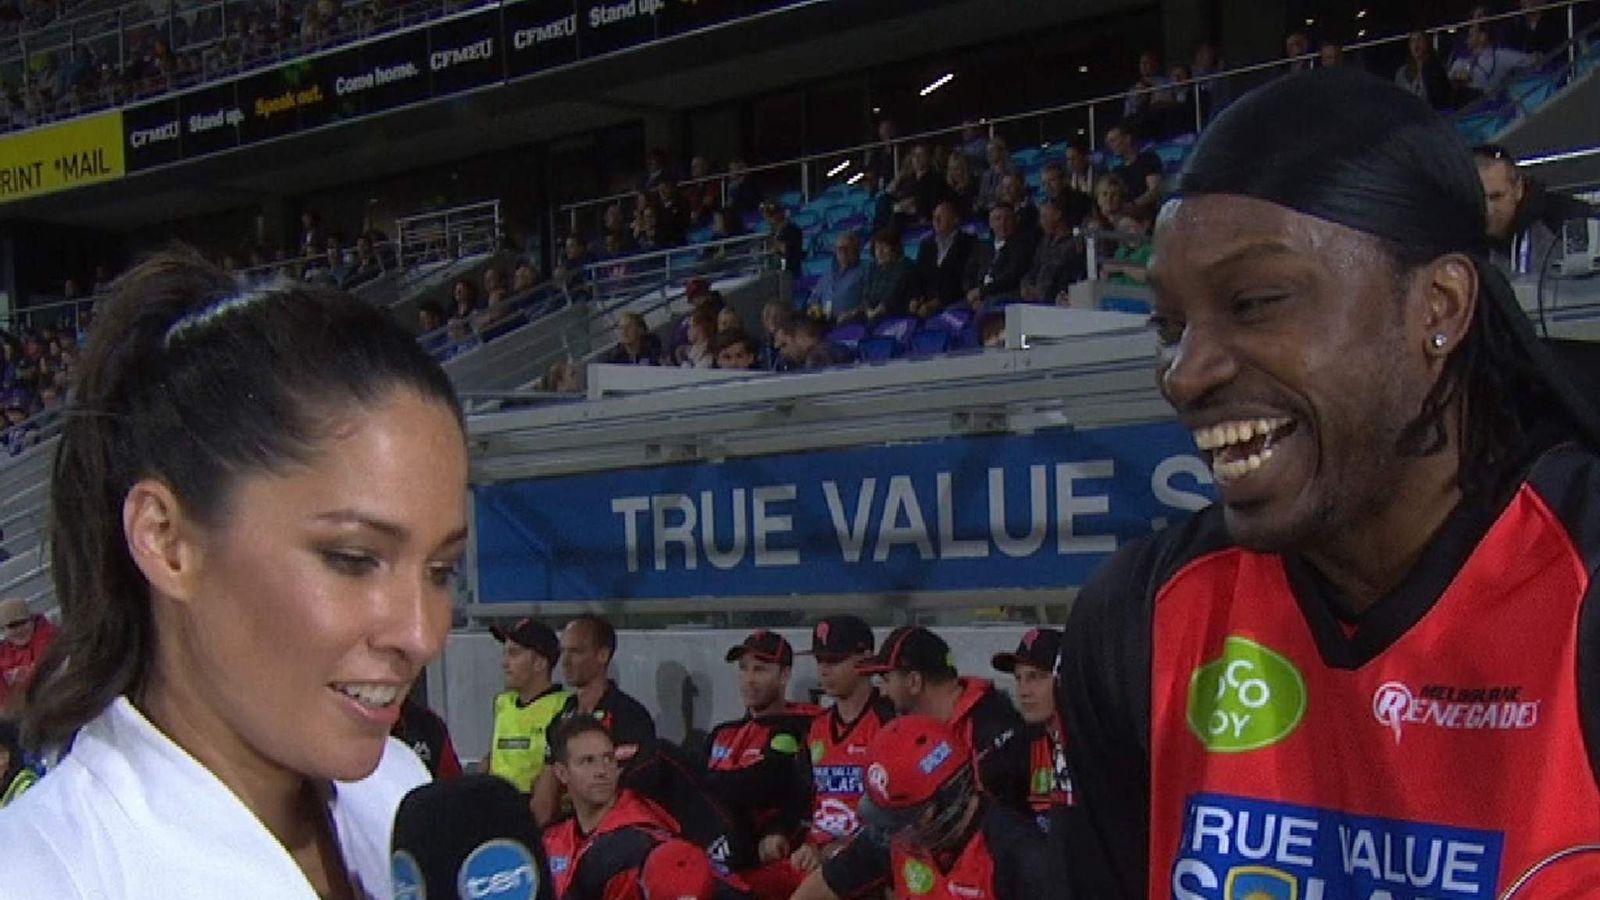 Cricketer Chris Gayle flirts with Ten's Melanie McLaughlin